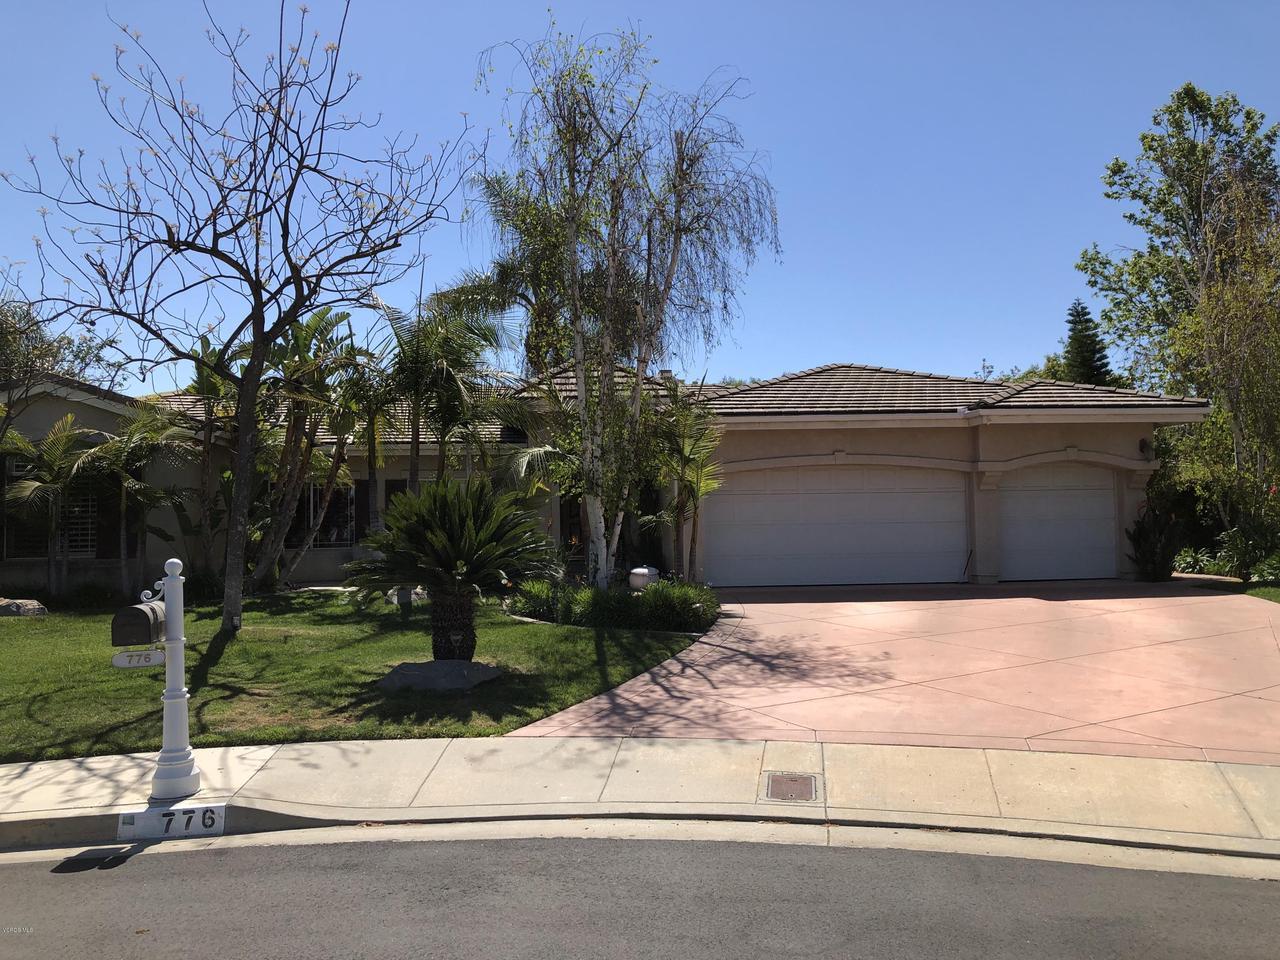 776 EMERSON, Thousand Oaks, CA 91362 - IMG_5898